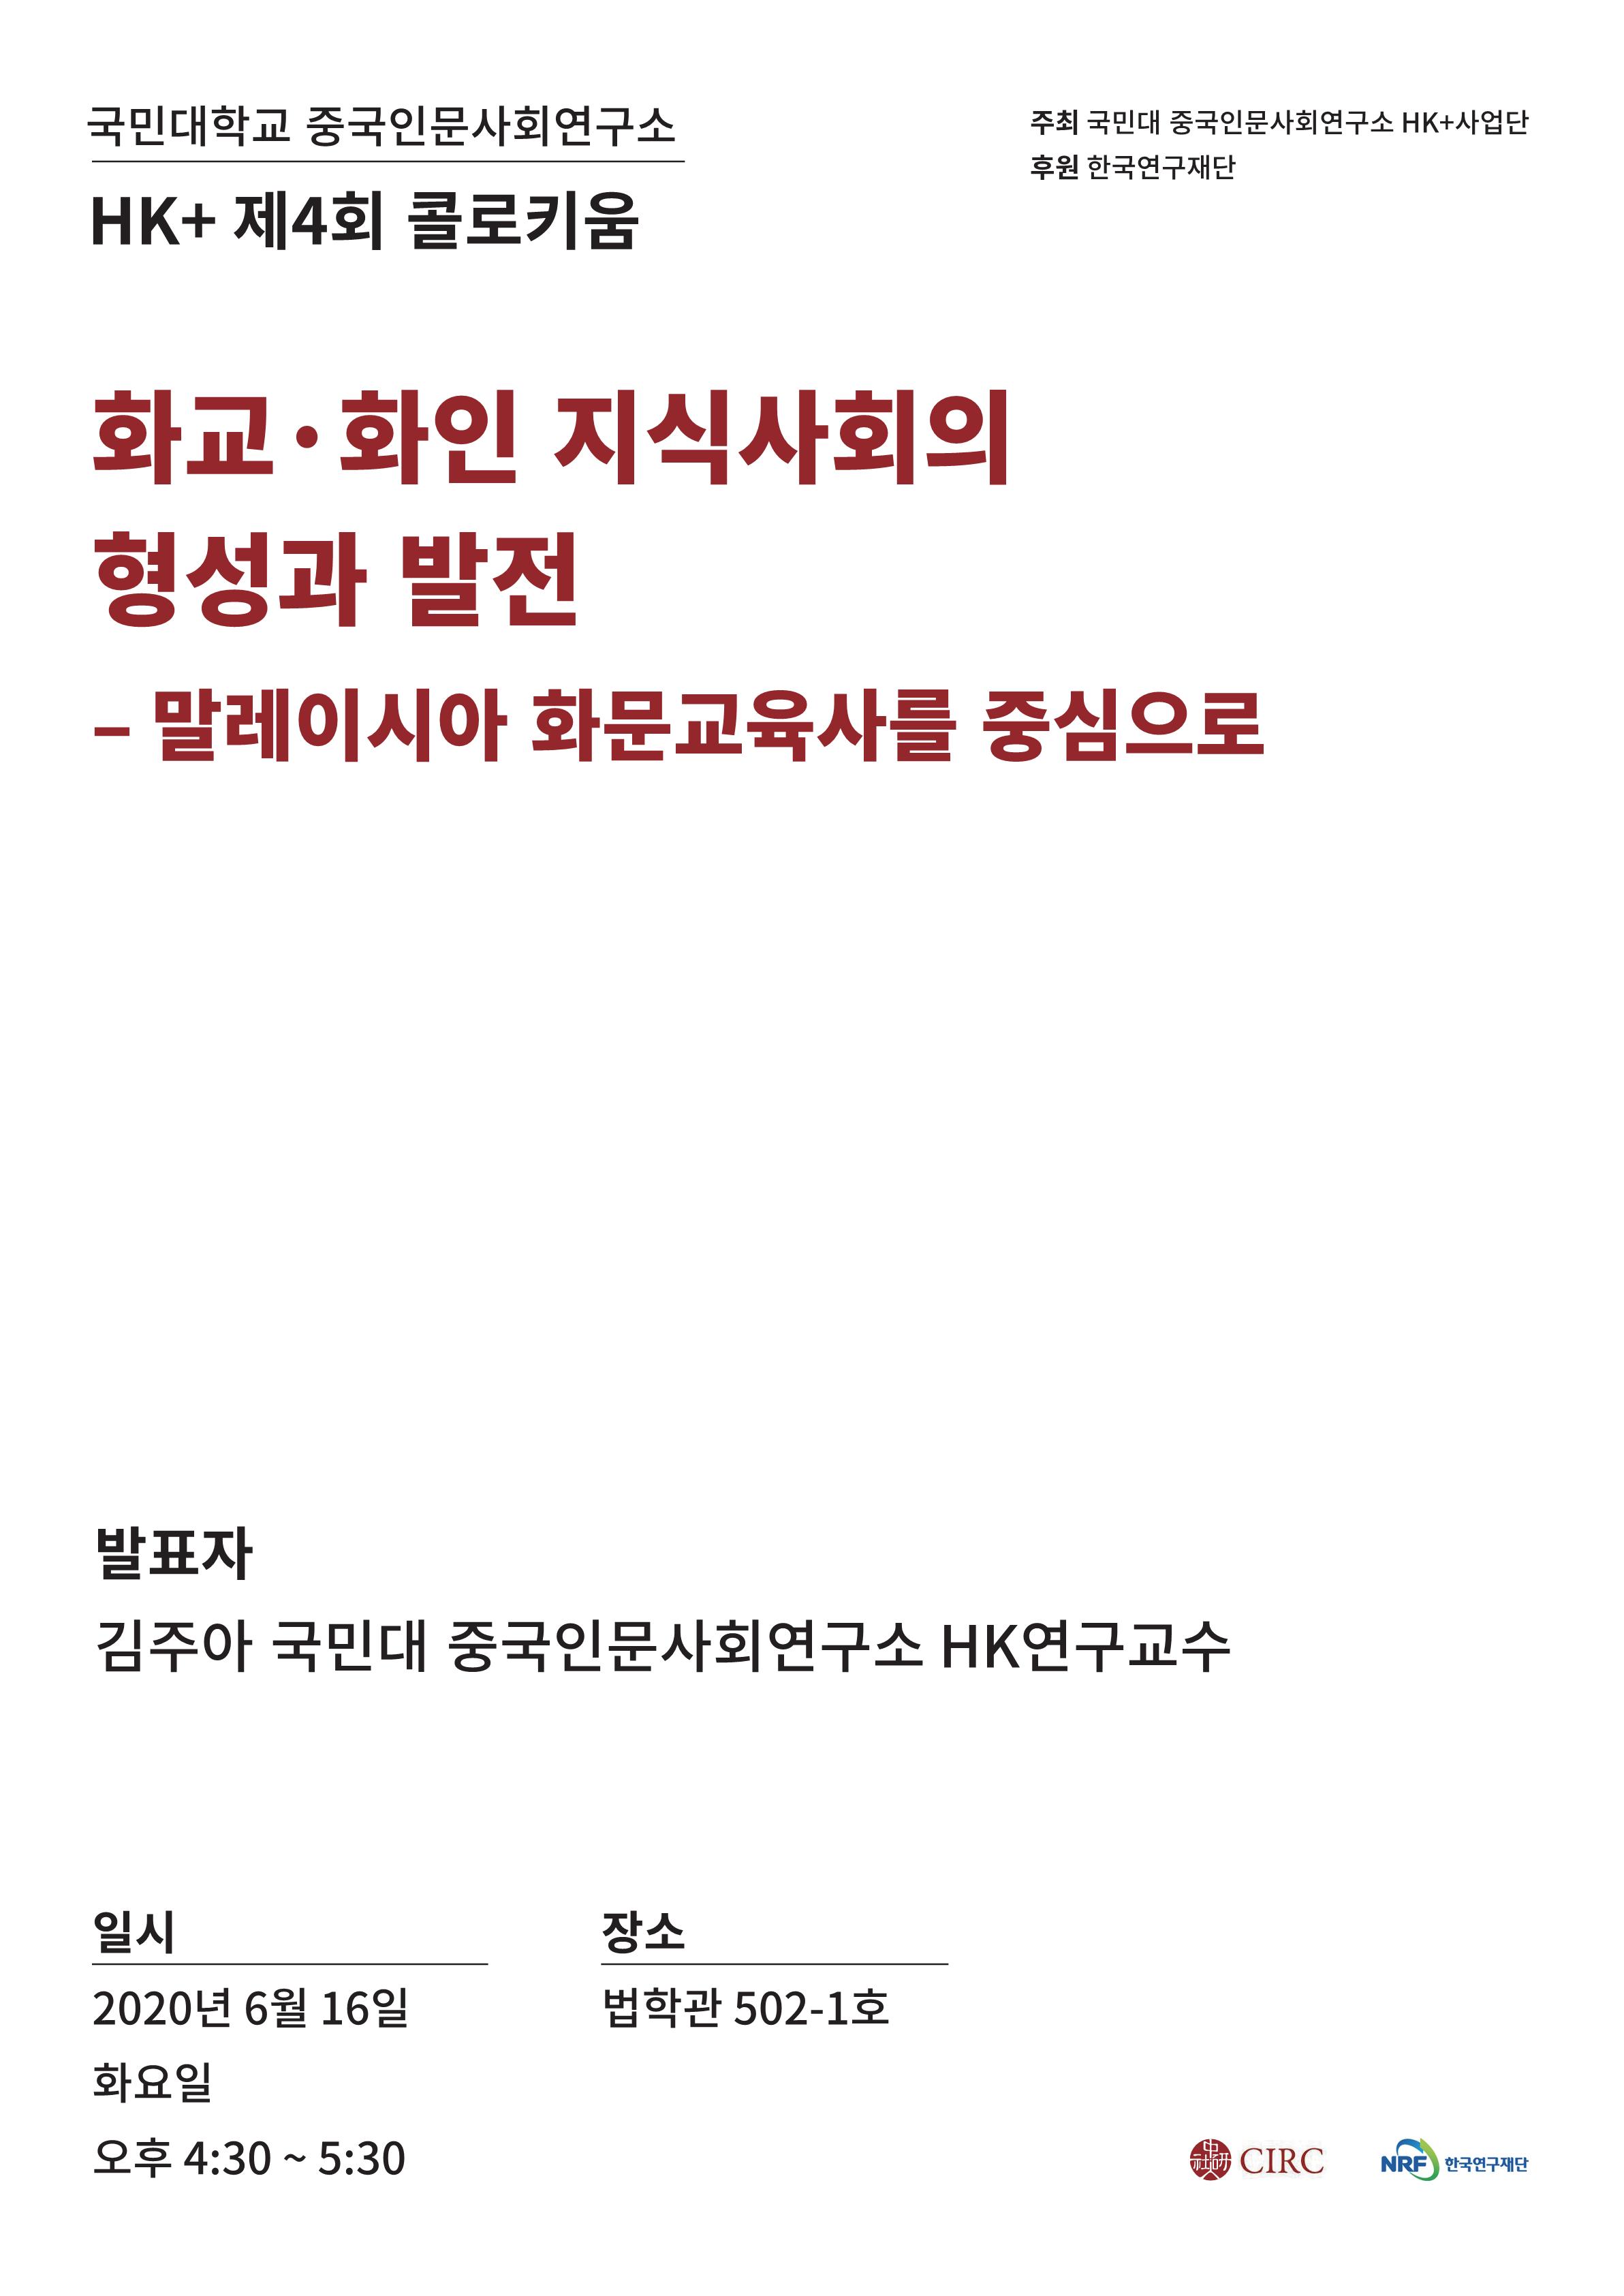 HK+제4회콜로키움_6월 김주아_1.png